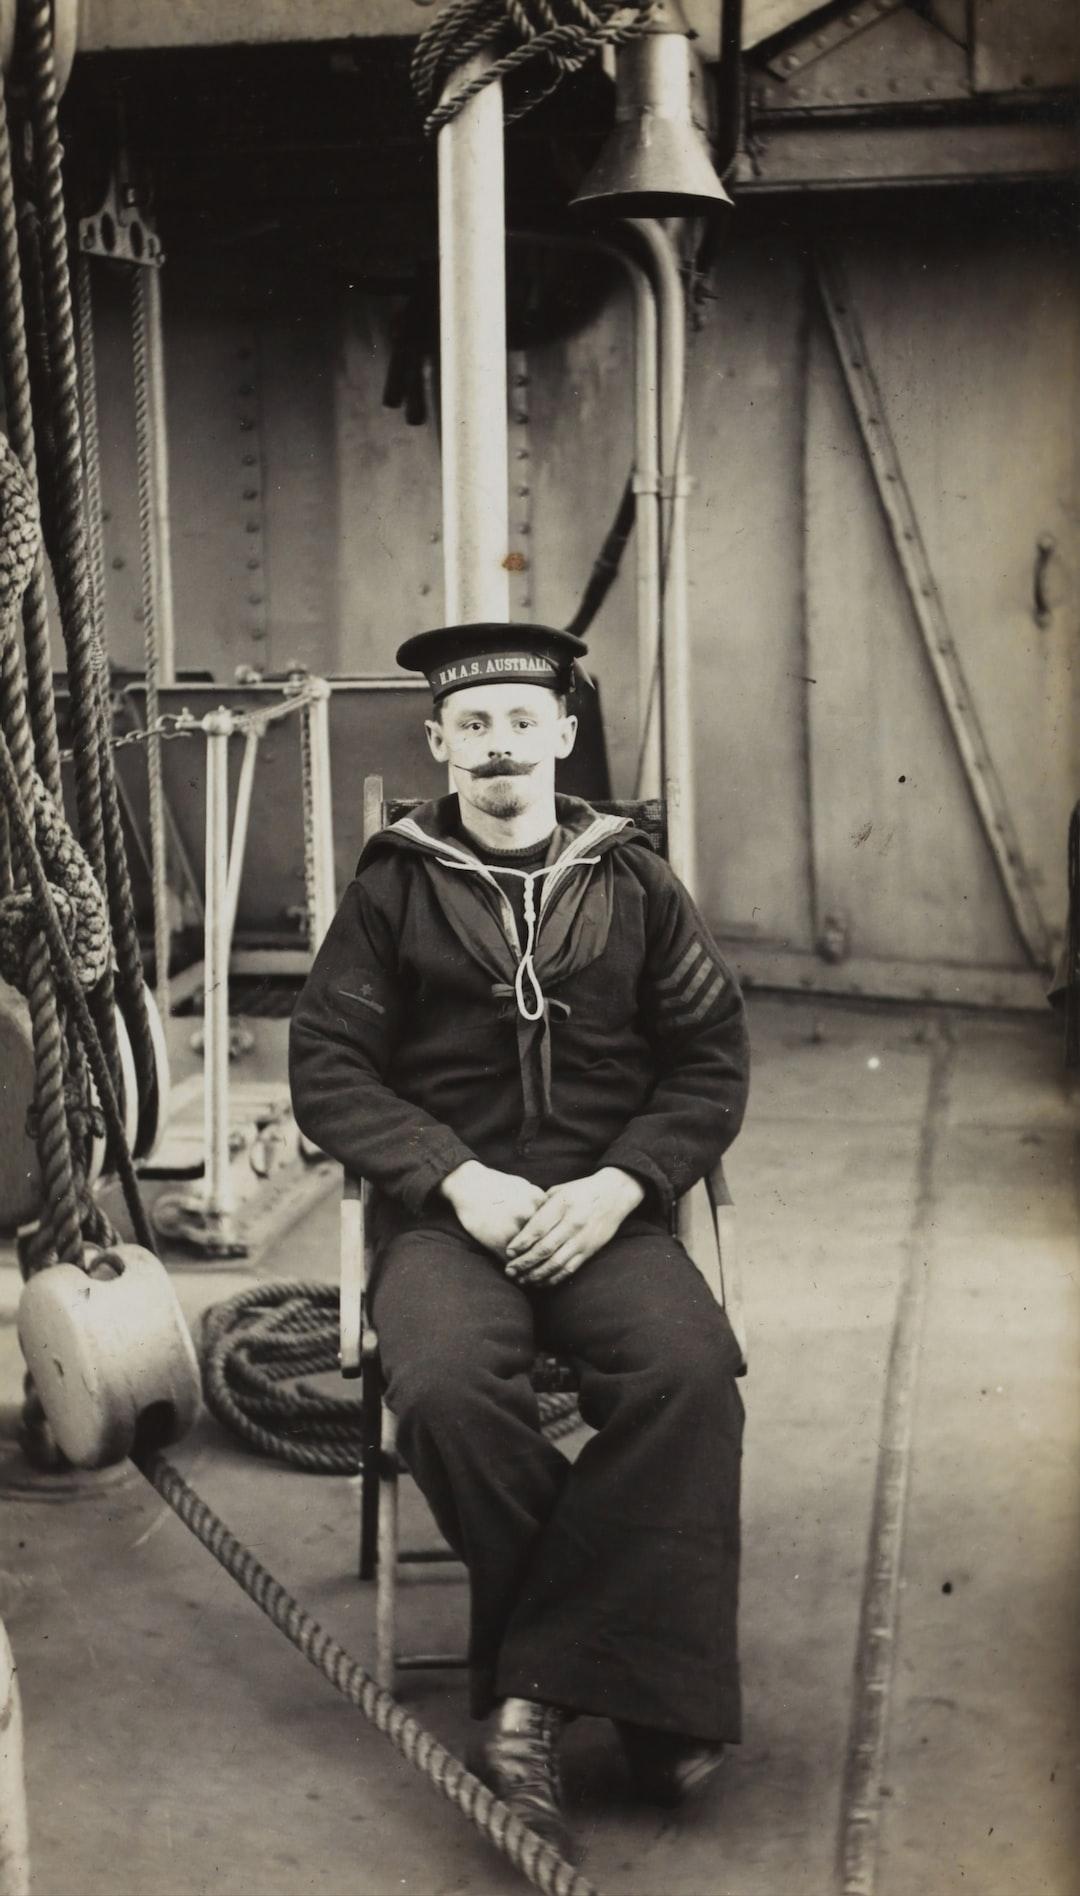 HMAS Australia, Portrait of a Seaman, 1915